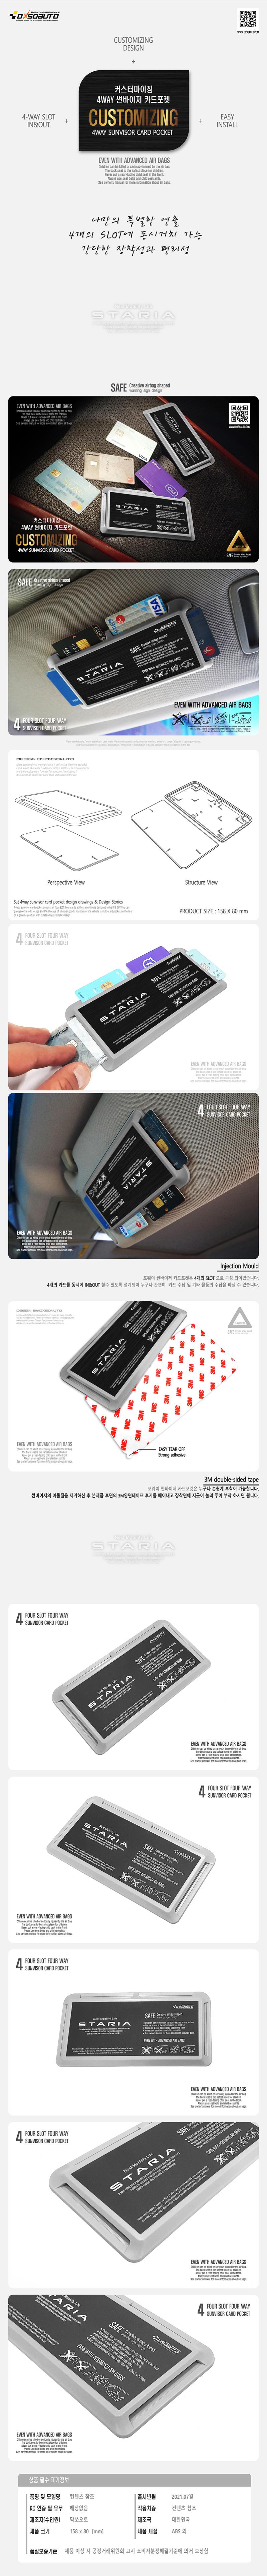 [DXSOAUTO] 커스터마이징 4WAY 썬바이저 카드포켓 (1EA / 1SET) 스타리아 실버